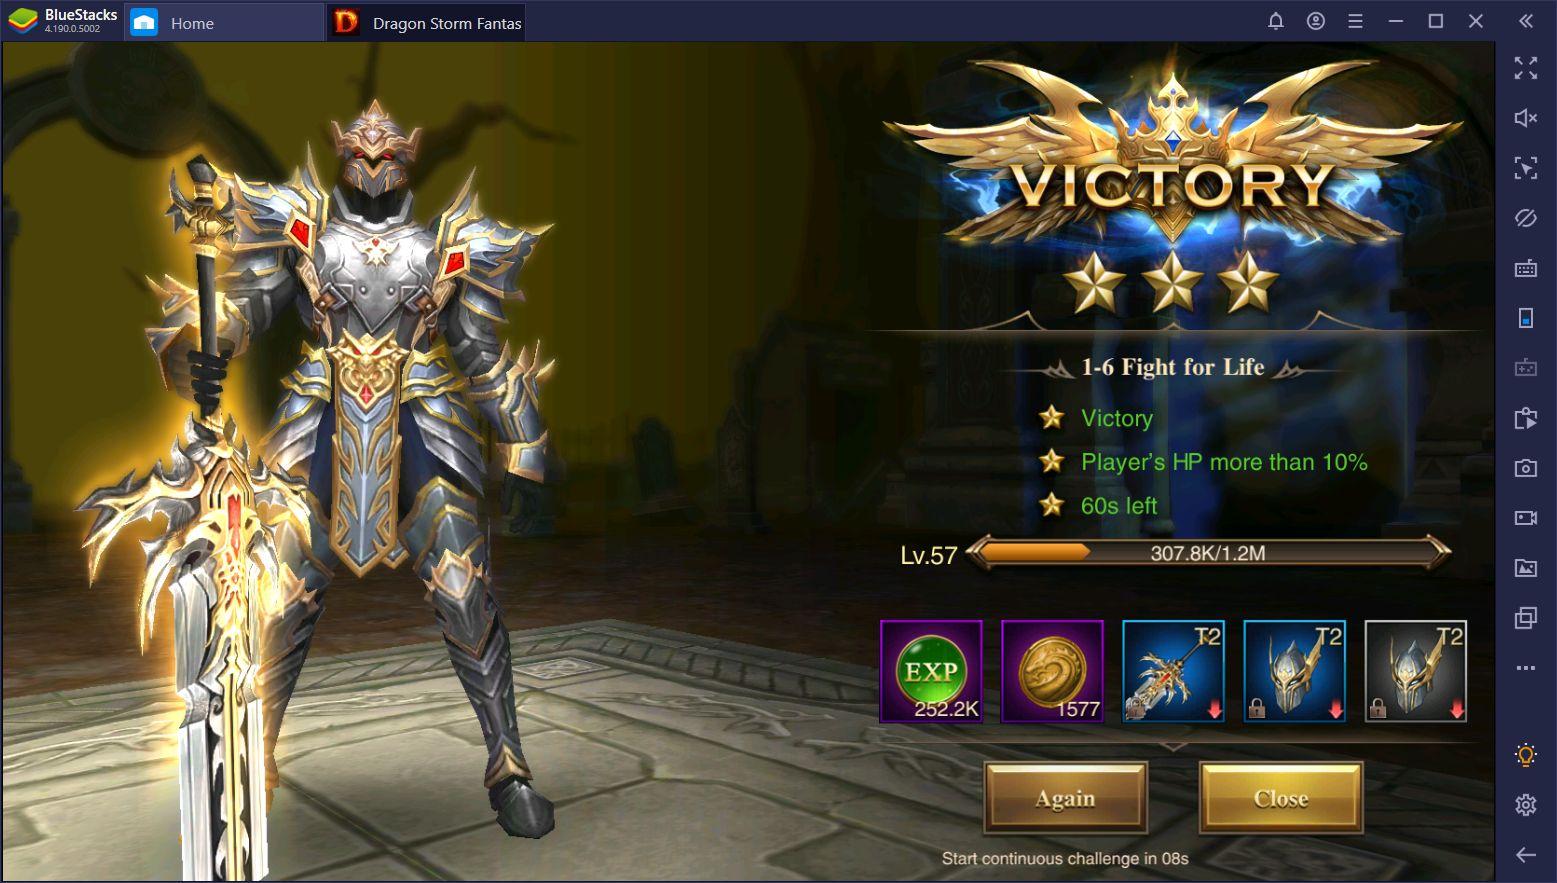 Dragon Storm Fantasy Gold Farming – Using BlueStacks to Generate Gold Automatically